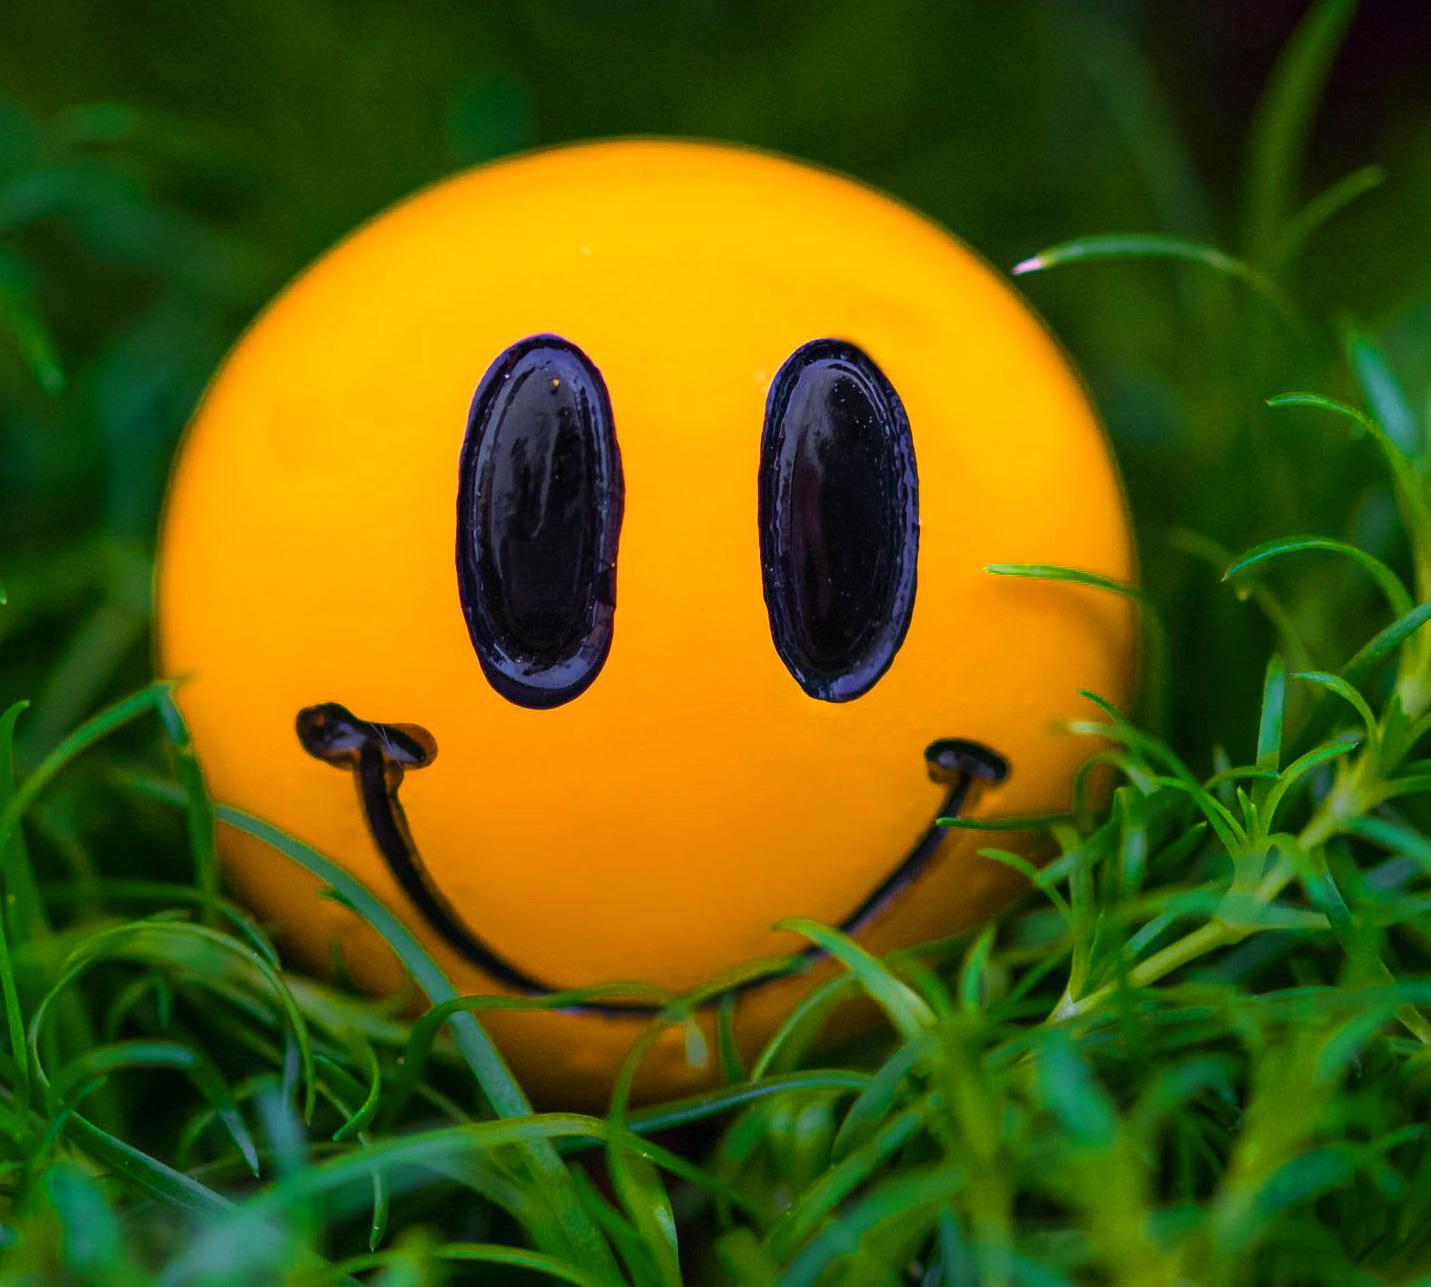 Smile Whatsapp Dp Images Wallpaper hd